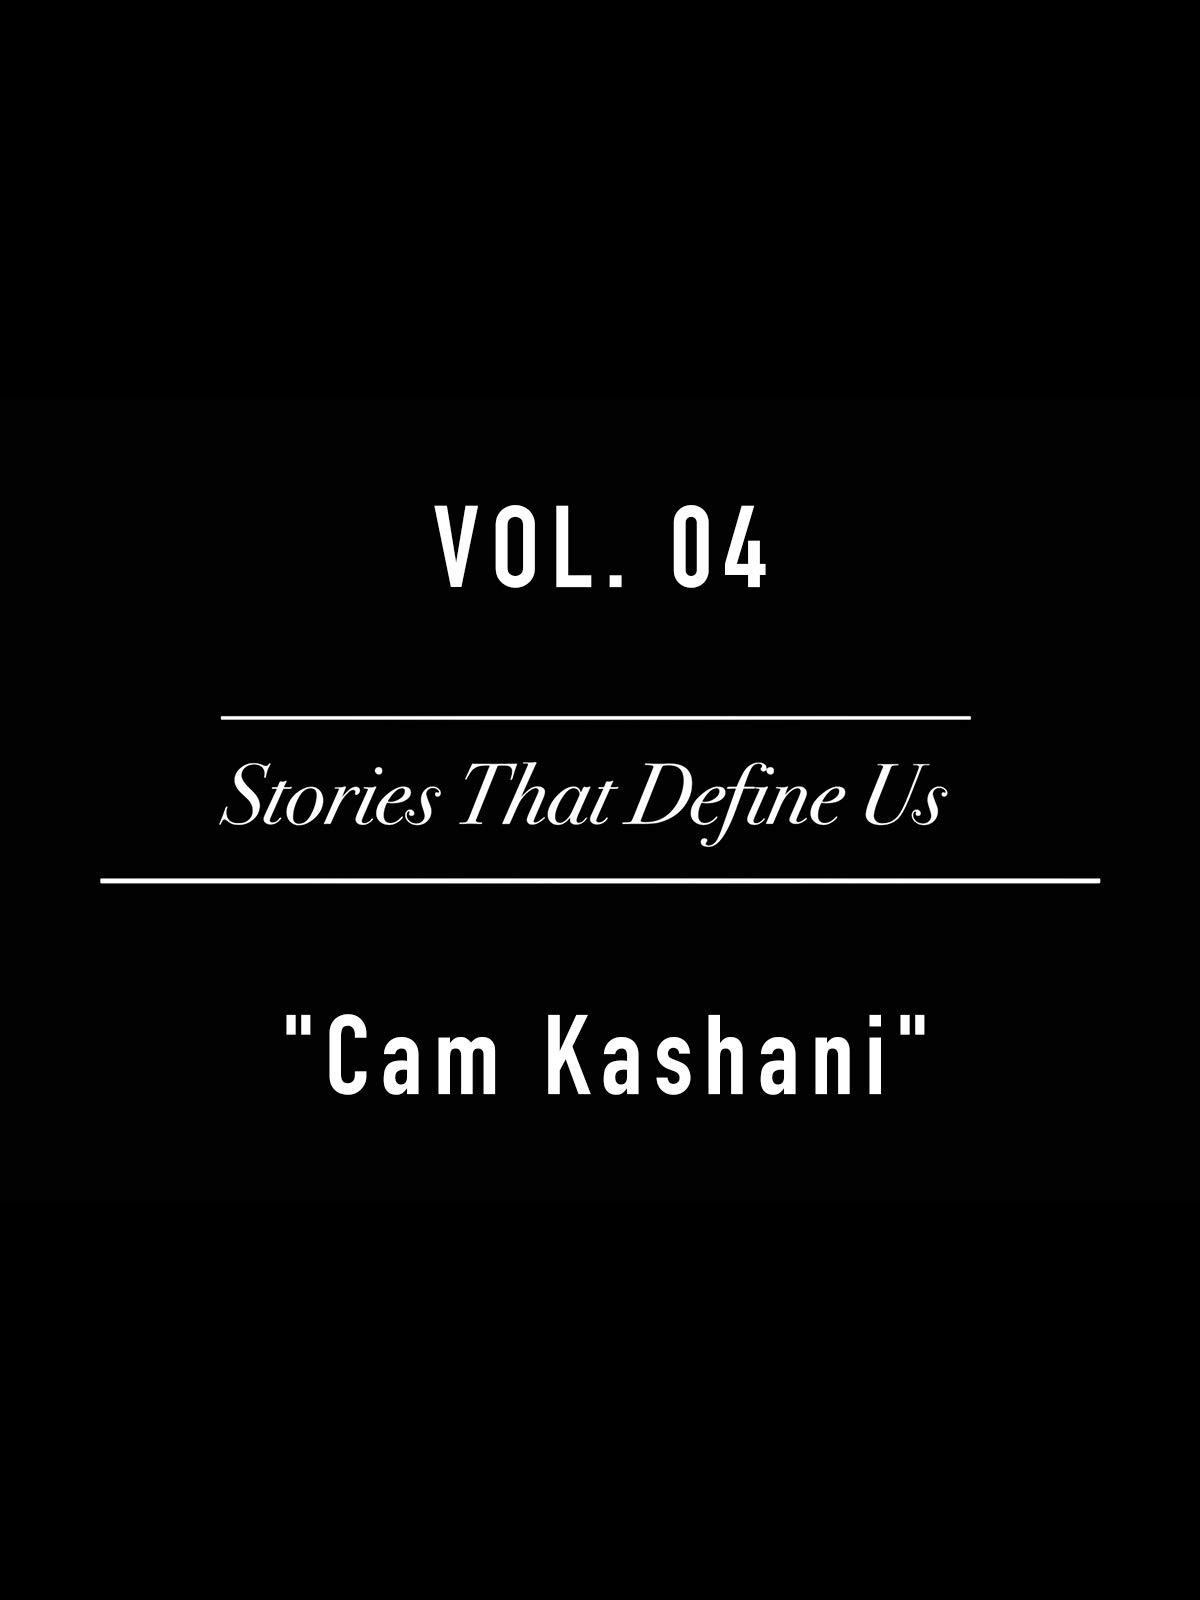 Stories That Define Us Vol. 04